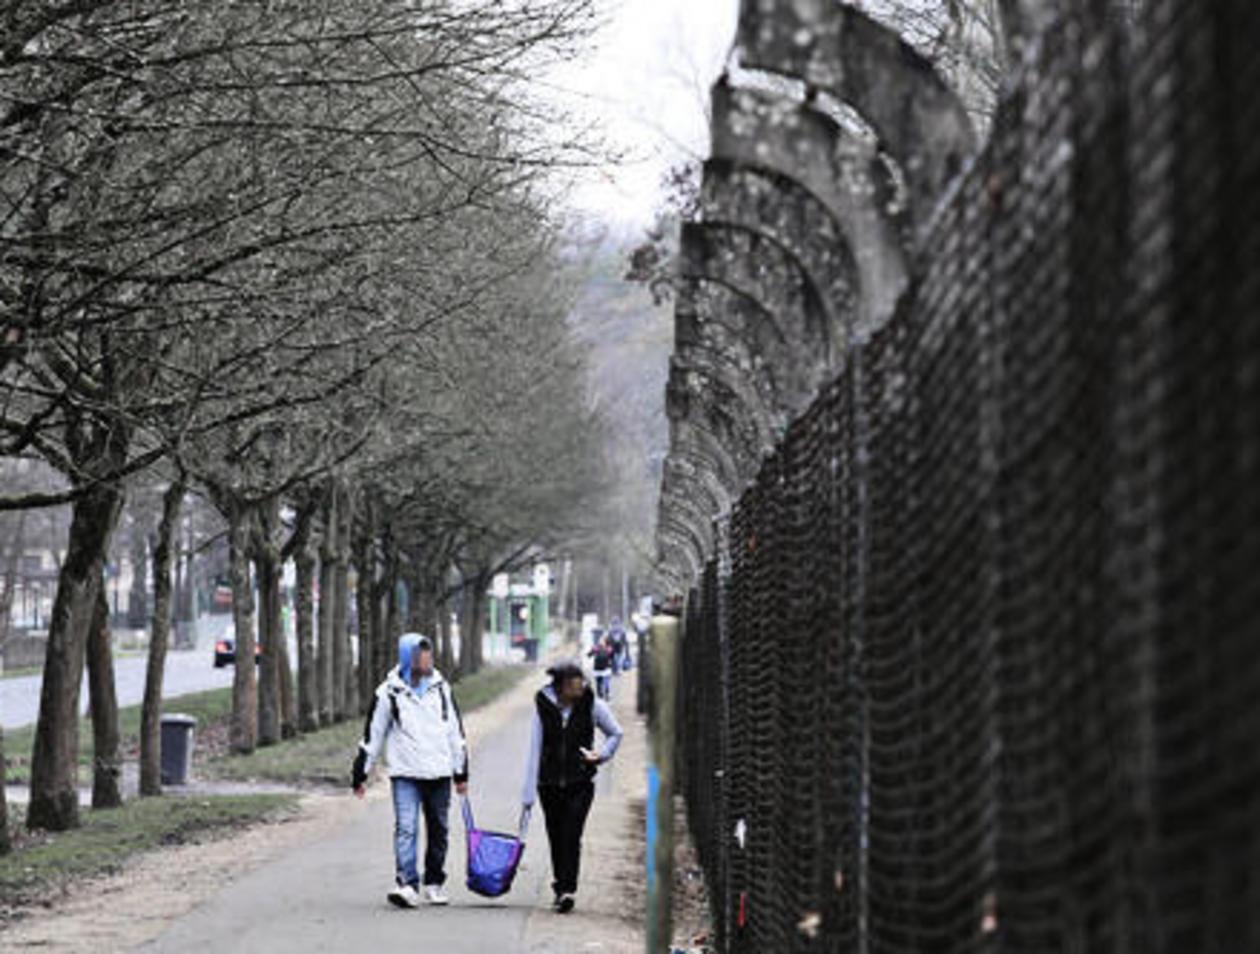 beklautGießen beklautGießen Andere Flüchtlinge Andere Flüchtlinge Andere USzMVp